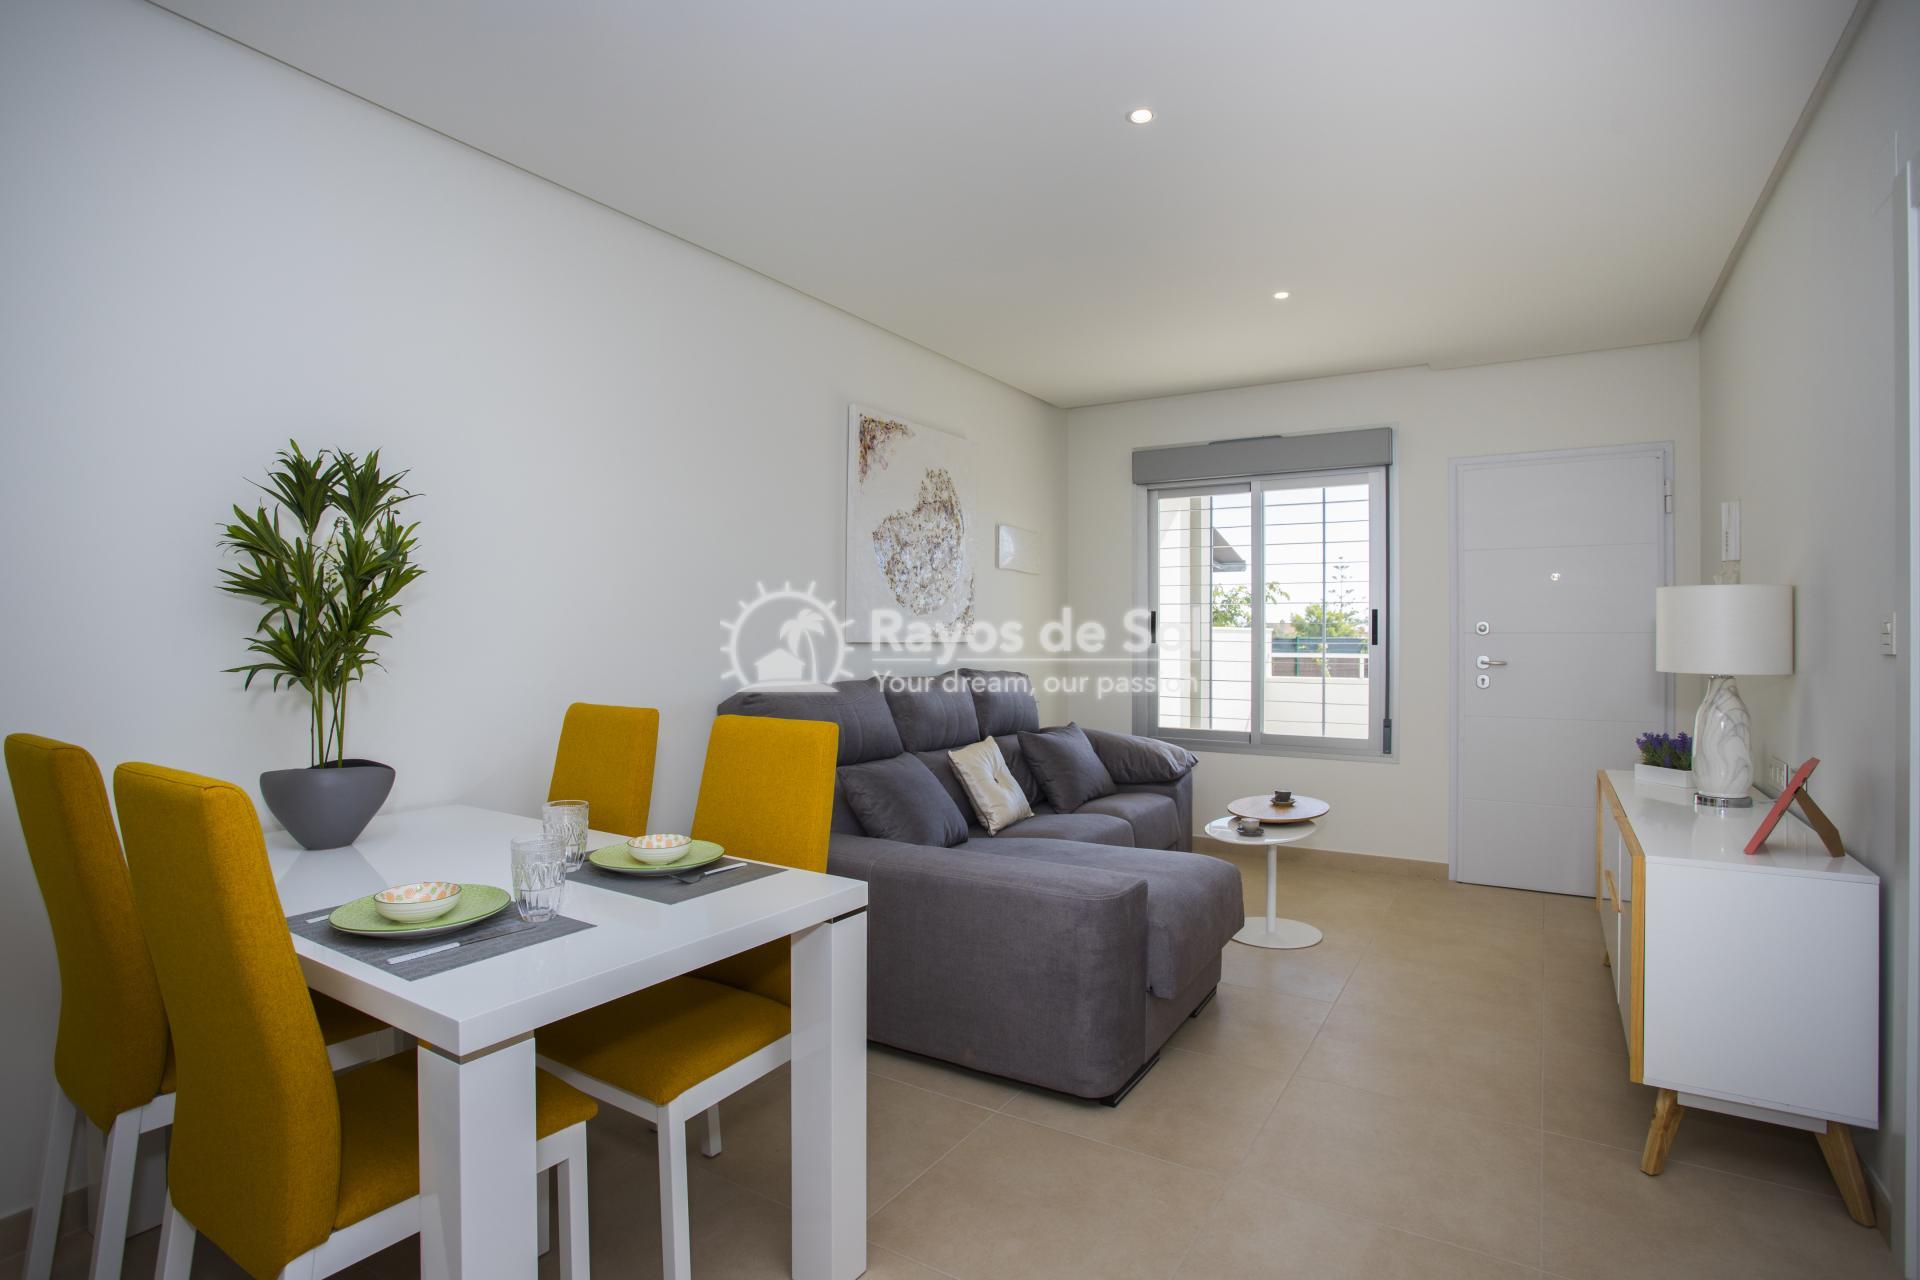 Appartement begane grond  in La Florida, Orihuela Costa, Costa Blanca (Oasis place BG3-2) - 2